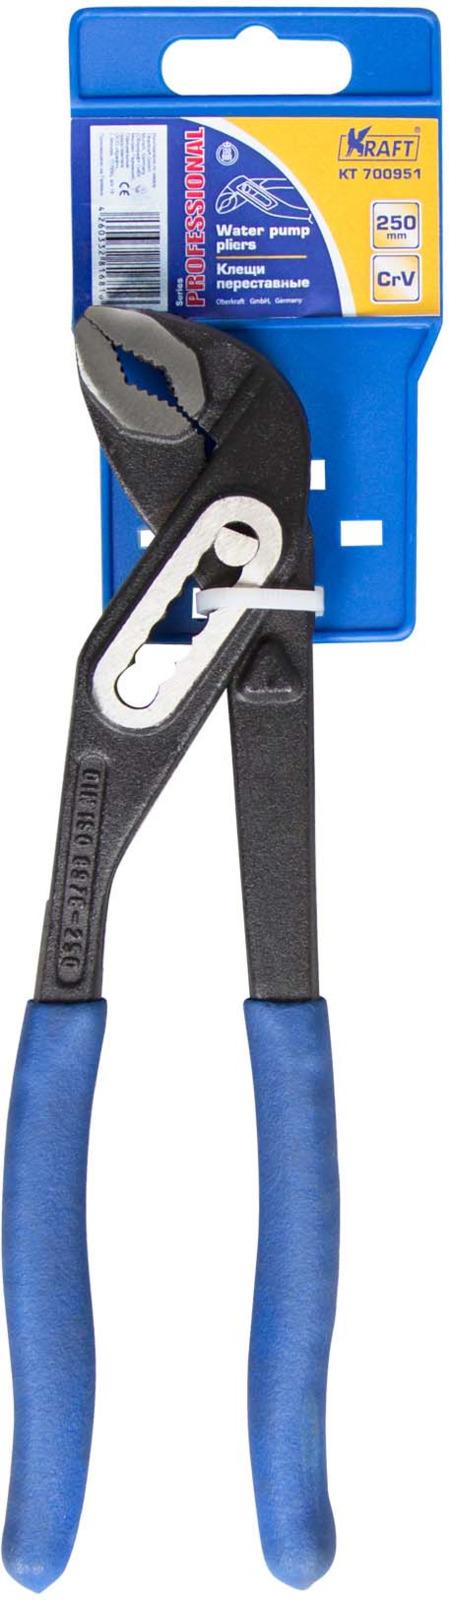 Клещи переставные Kraft Professional, серый металлик, синий, желтый, 250 мм цена